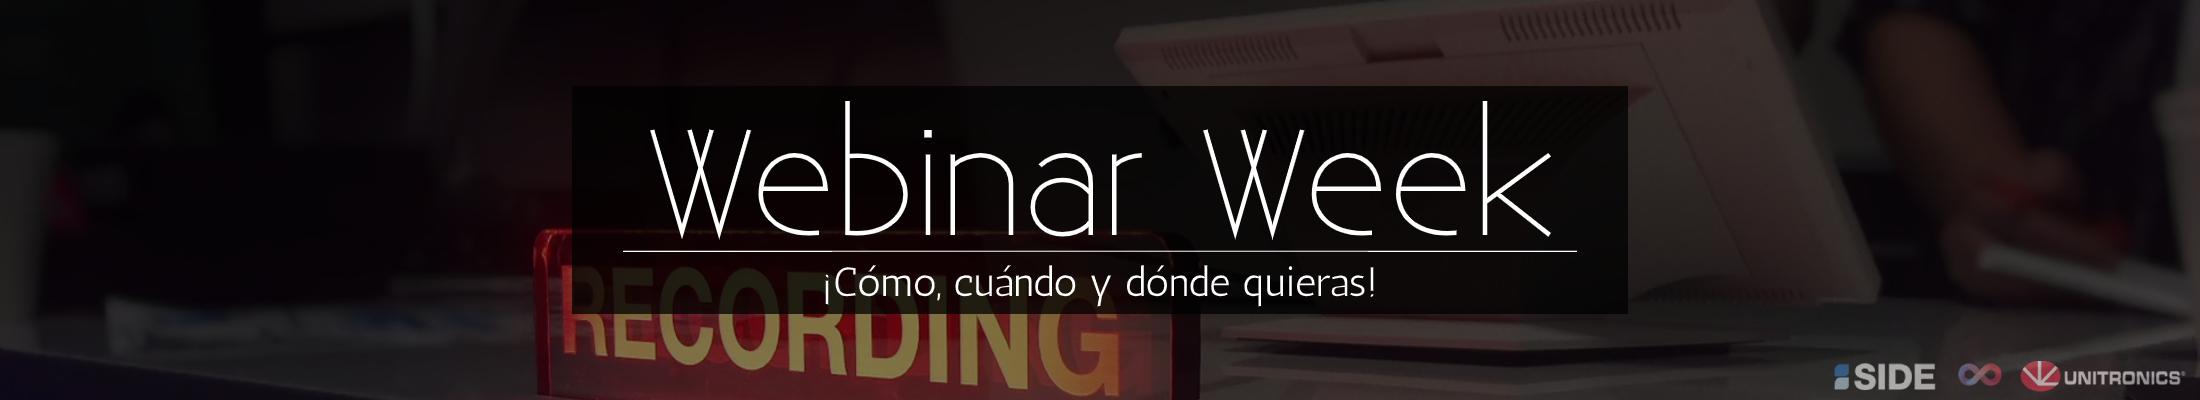 webinar-week-hmi-ladder-memorias-unistream-industria-automatizacion